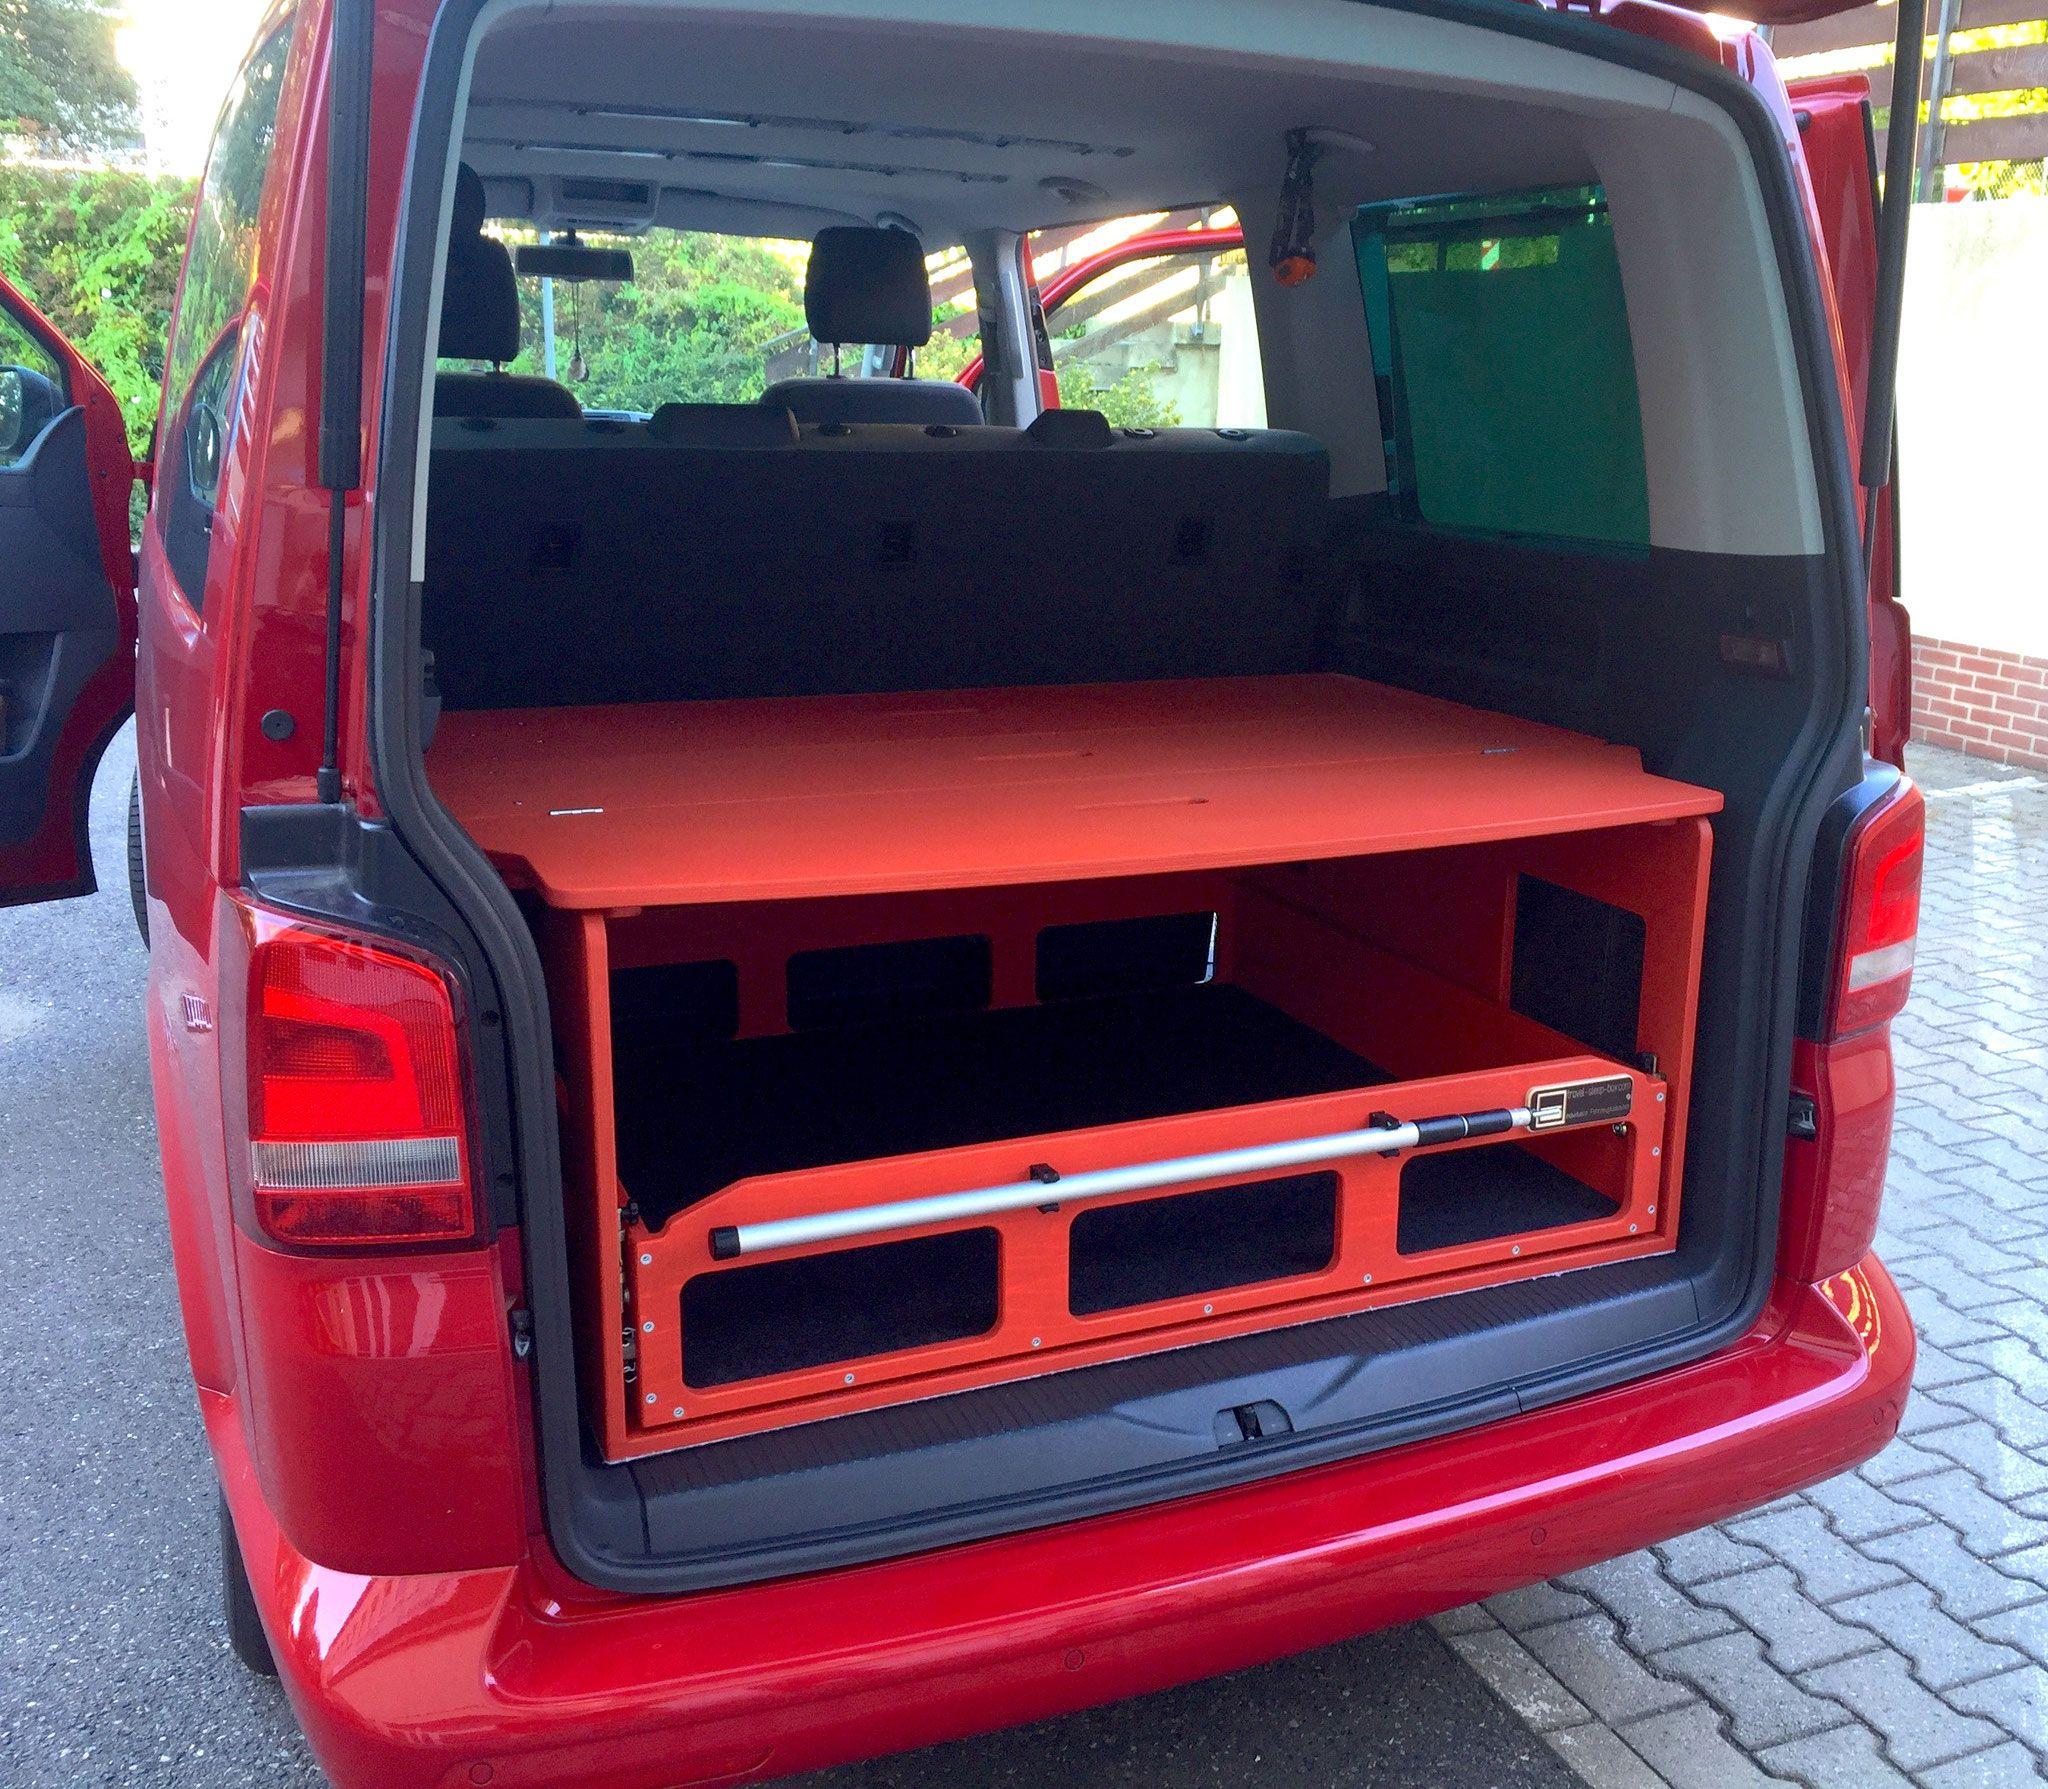 fahrzeugausbau camping multiflexboard alternative vw t5 multivan vw t6 multivan vw t5. Black Bedroom Furniture Sets. Home Design Ideas